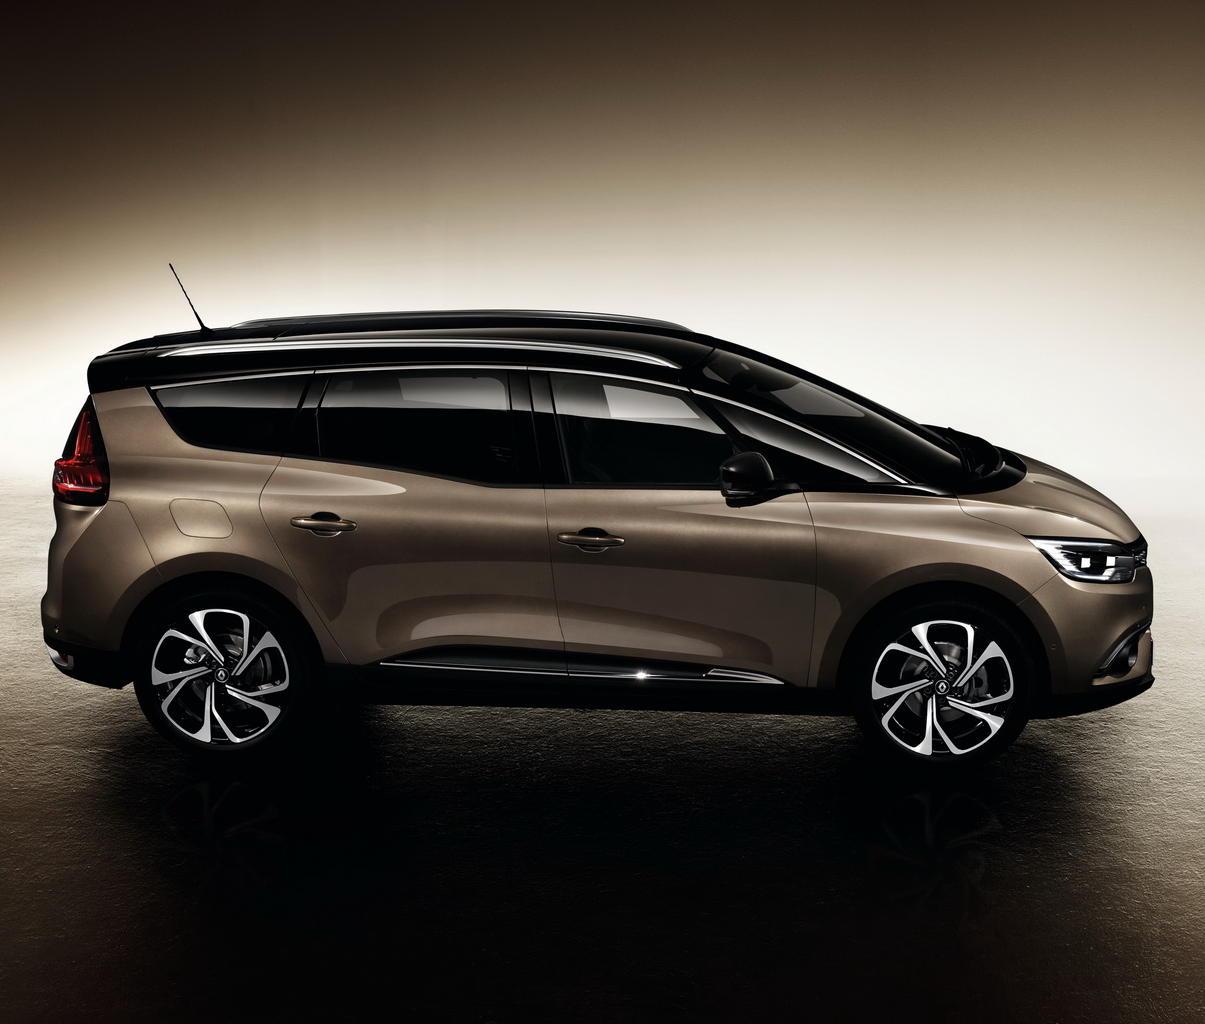 новый Renault Grand Scenic 2017 сбоку